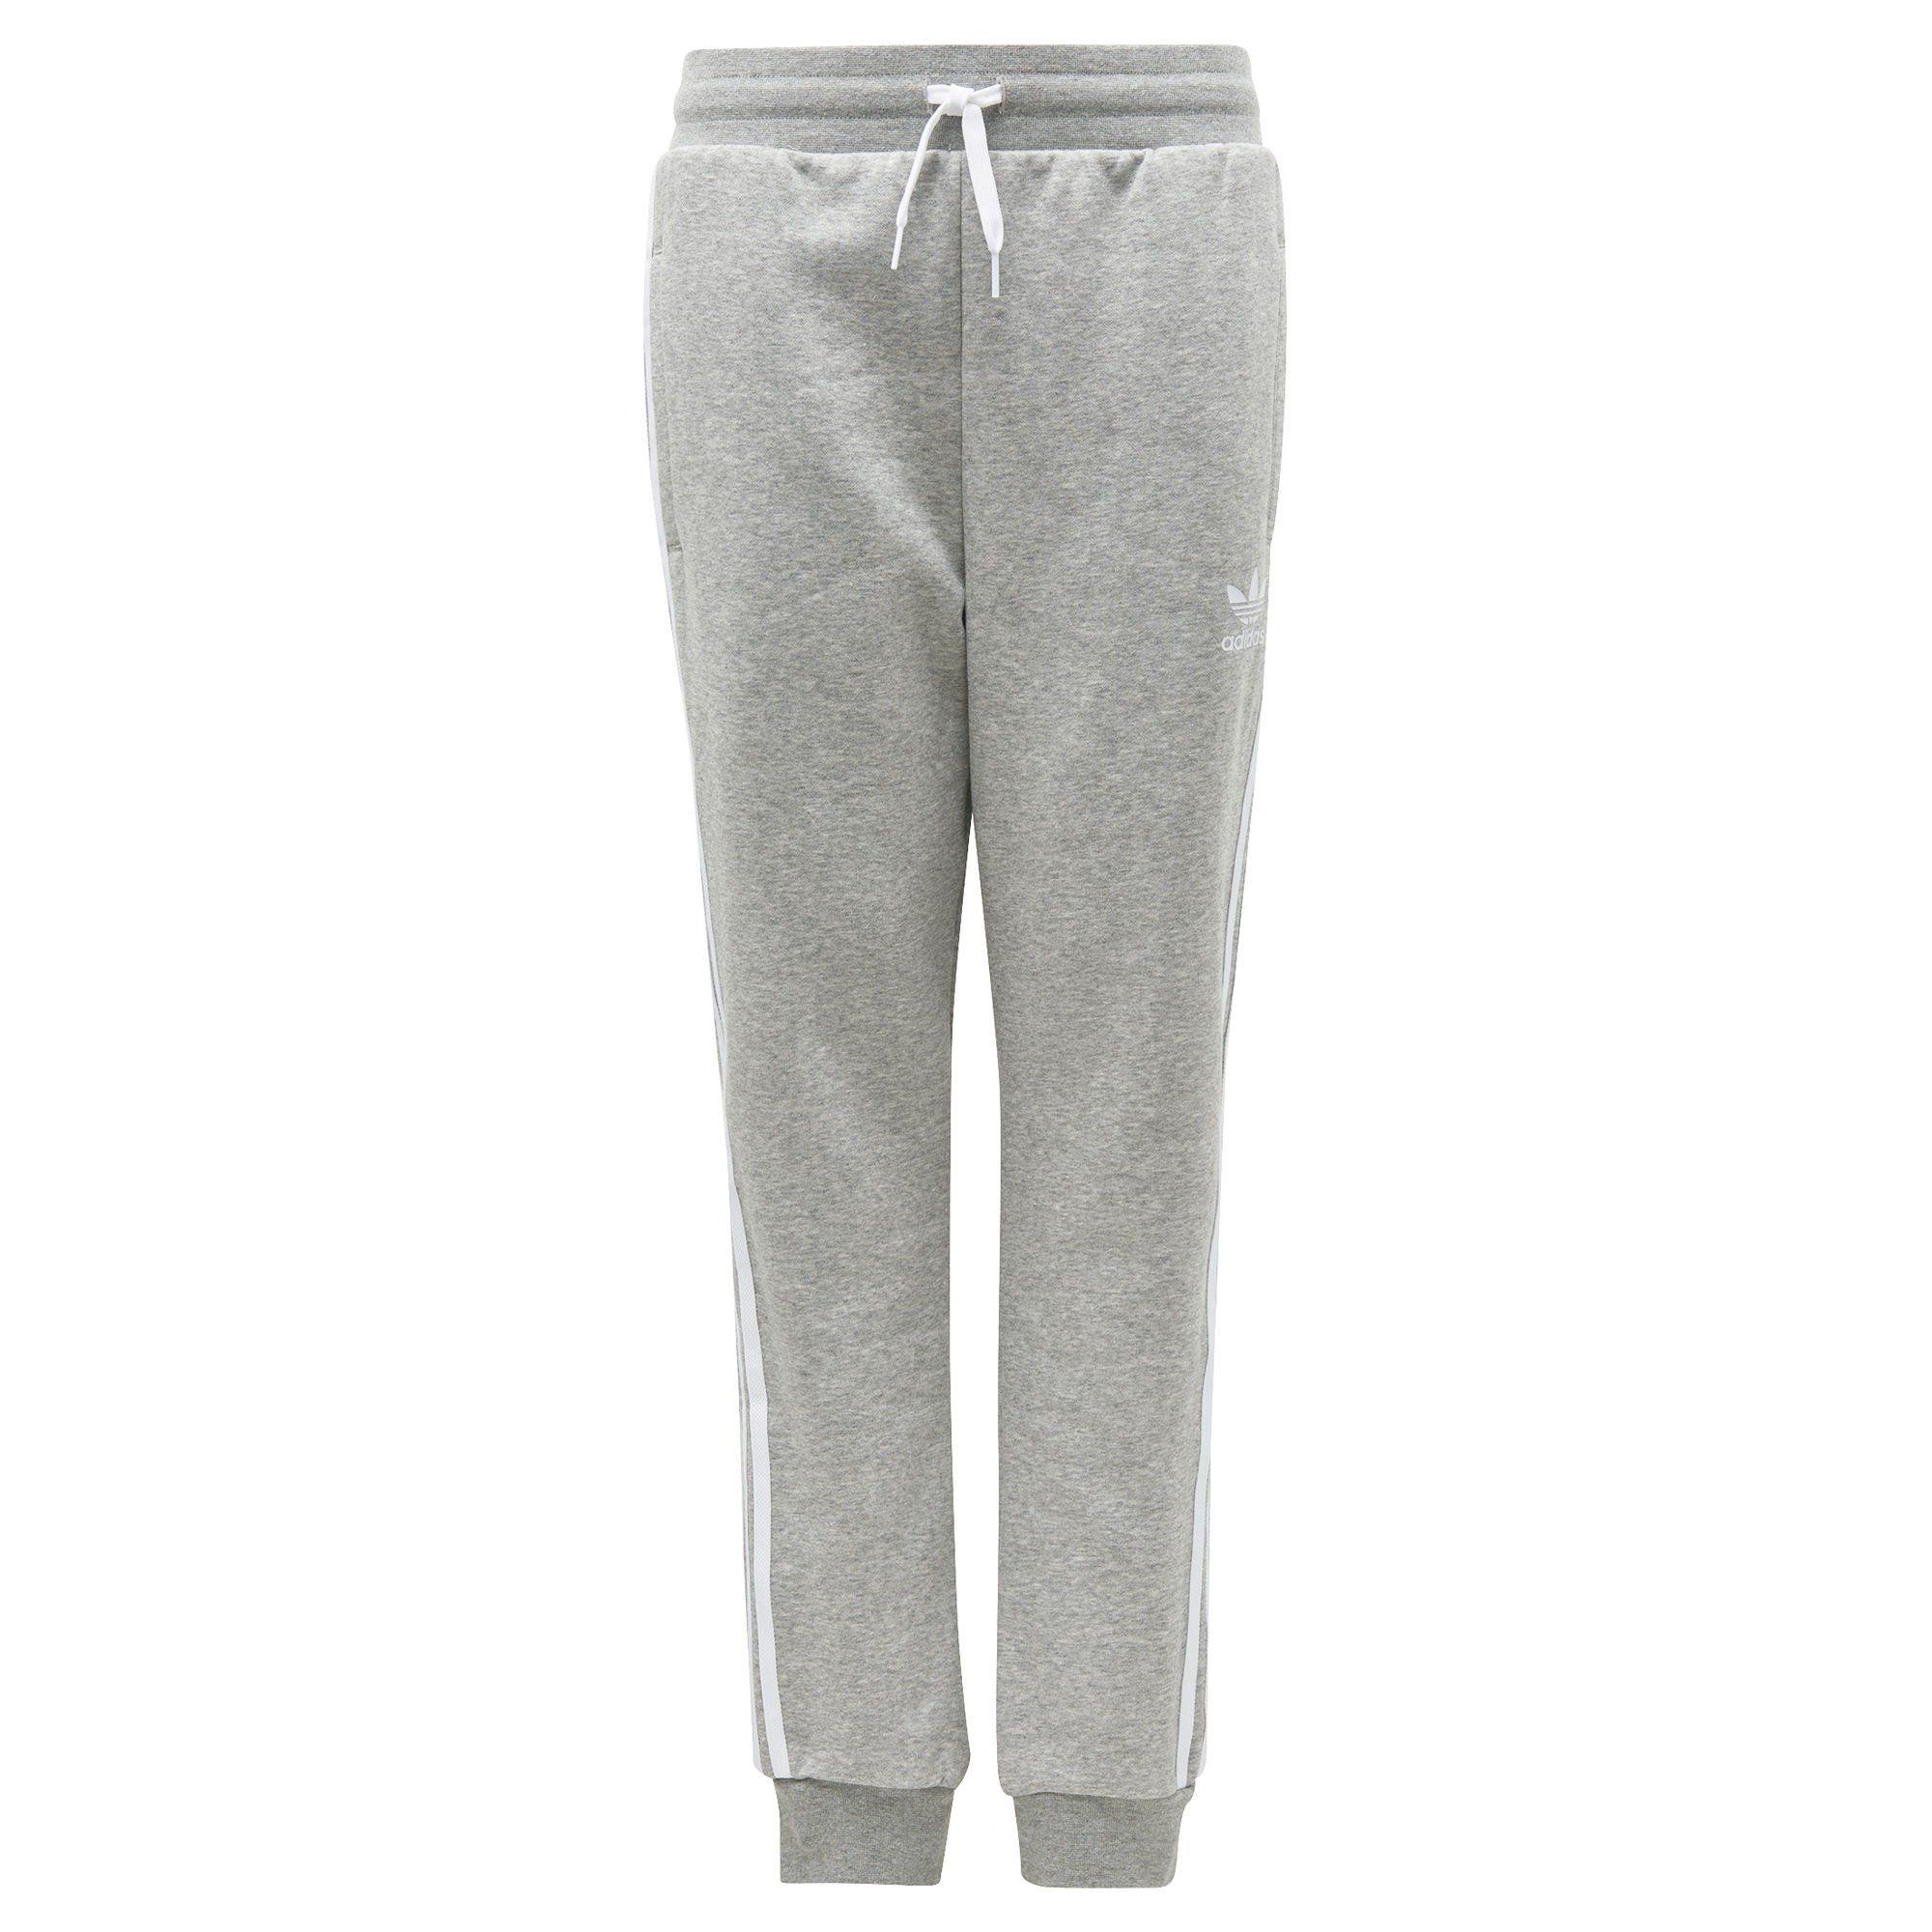 adidas Originals Sporthose »Fleece Jogginghose« adicolor online kaufen   OTTO